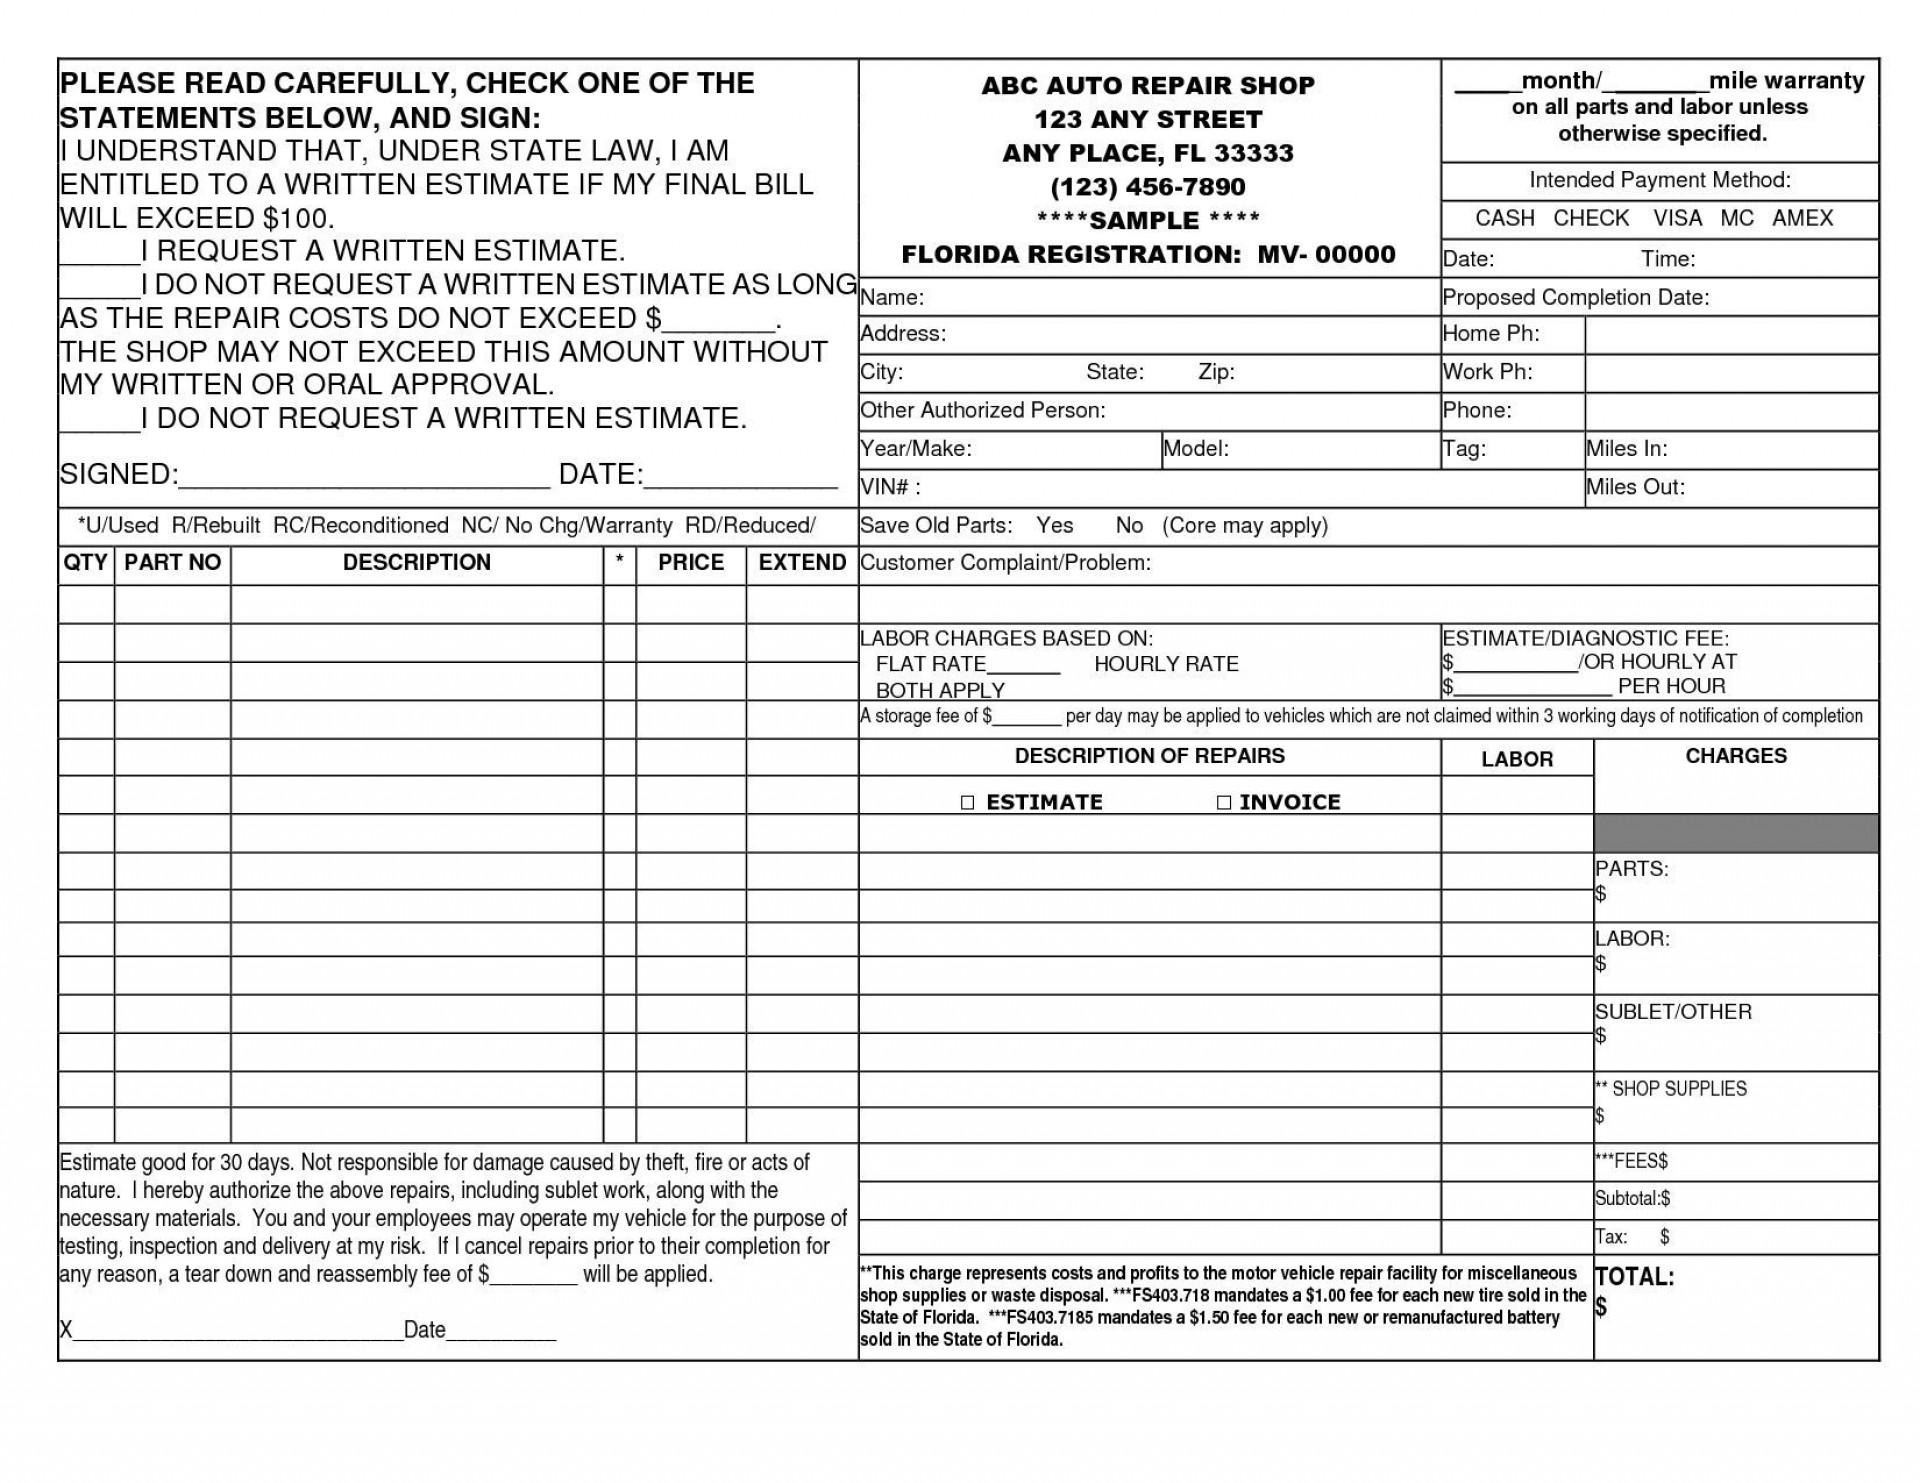 004 Stunning Auto Repair Invoice Template Pdf Idea  Free Form Receipt1920